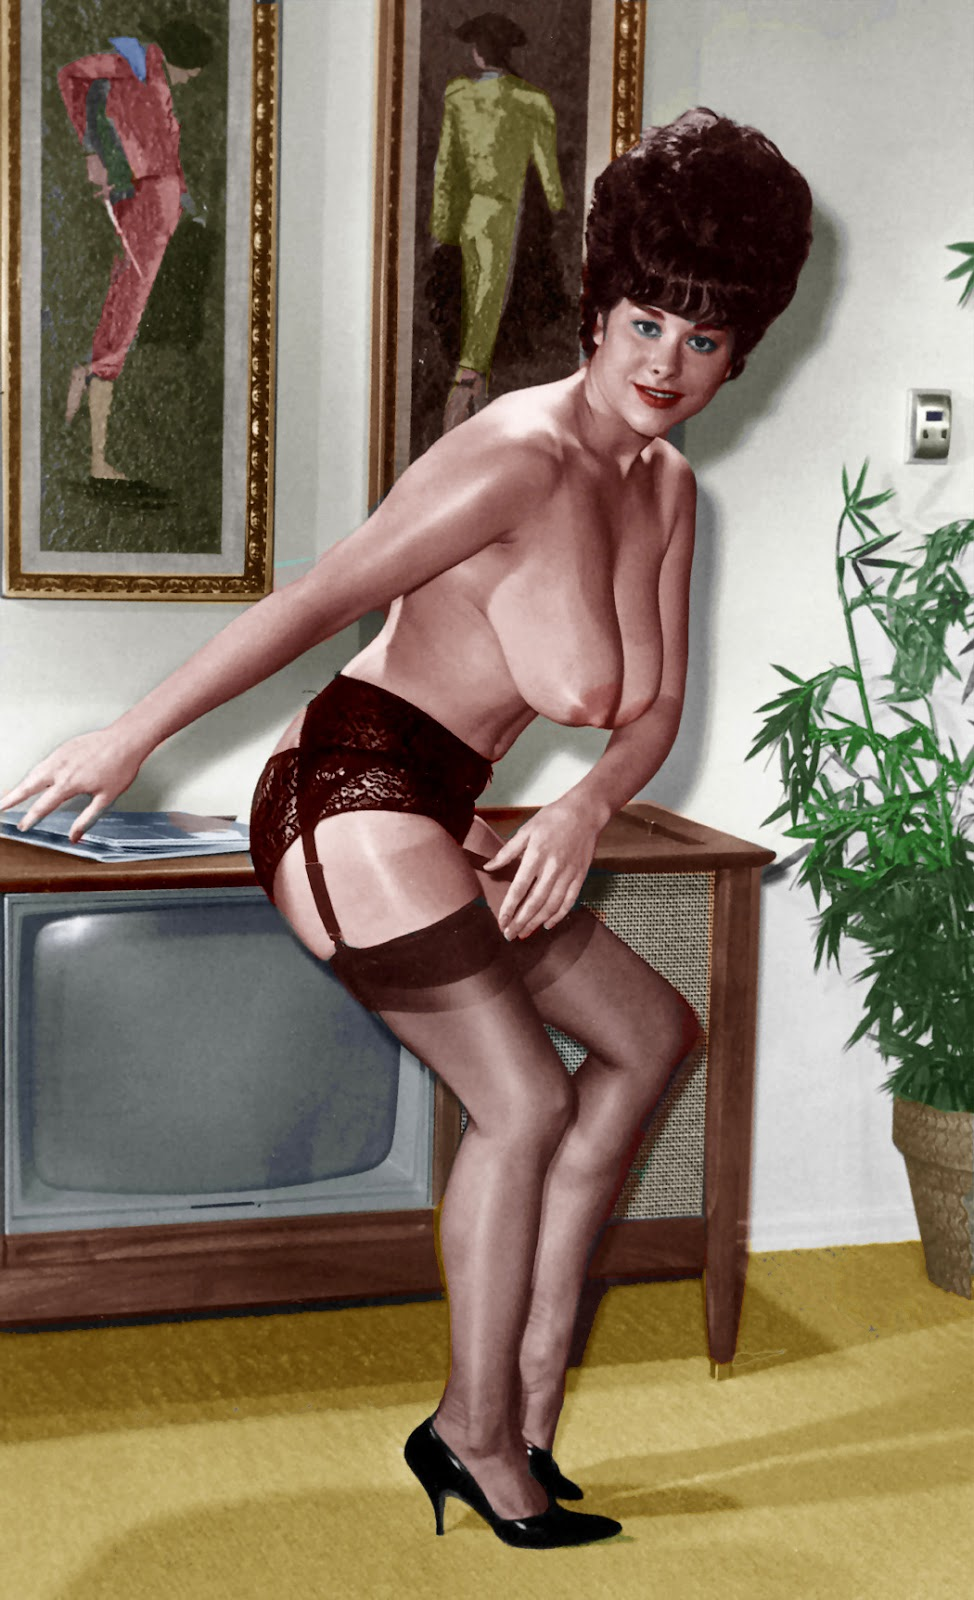 southern girls naked sex